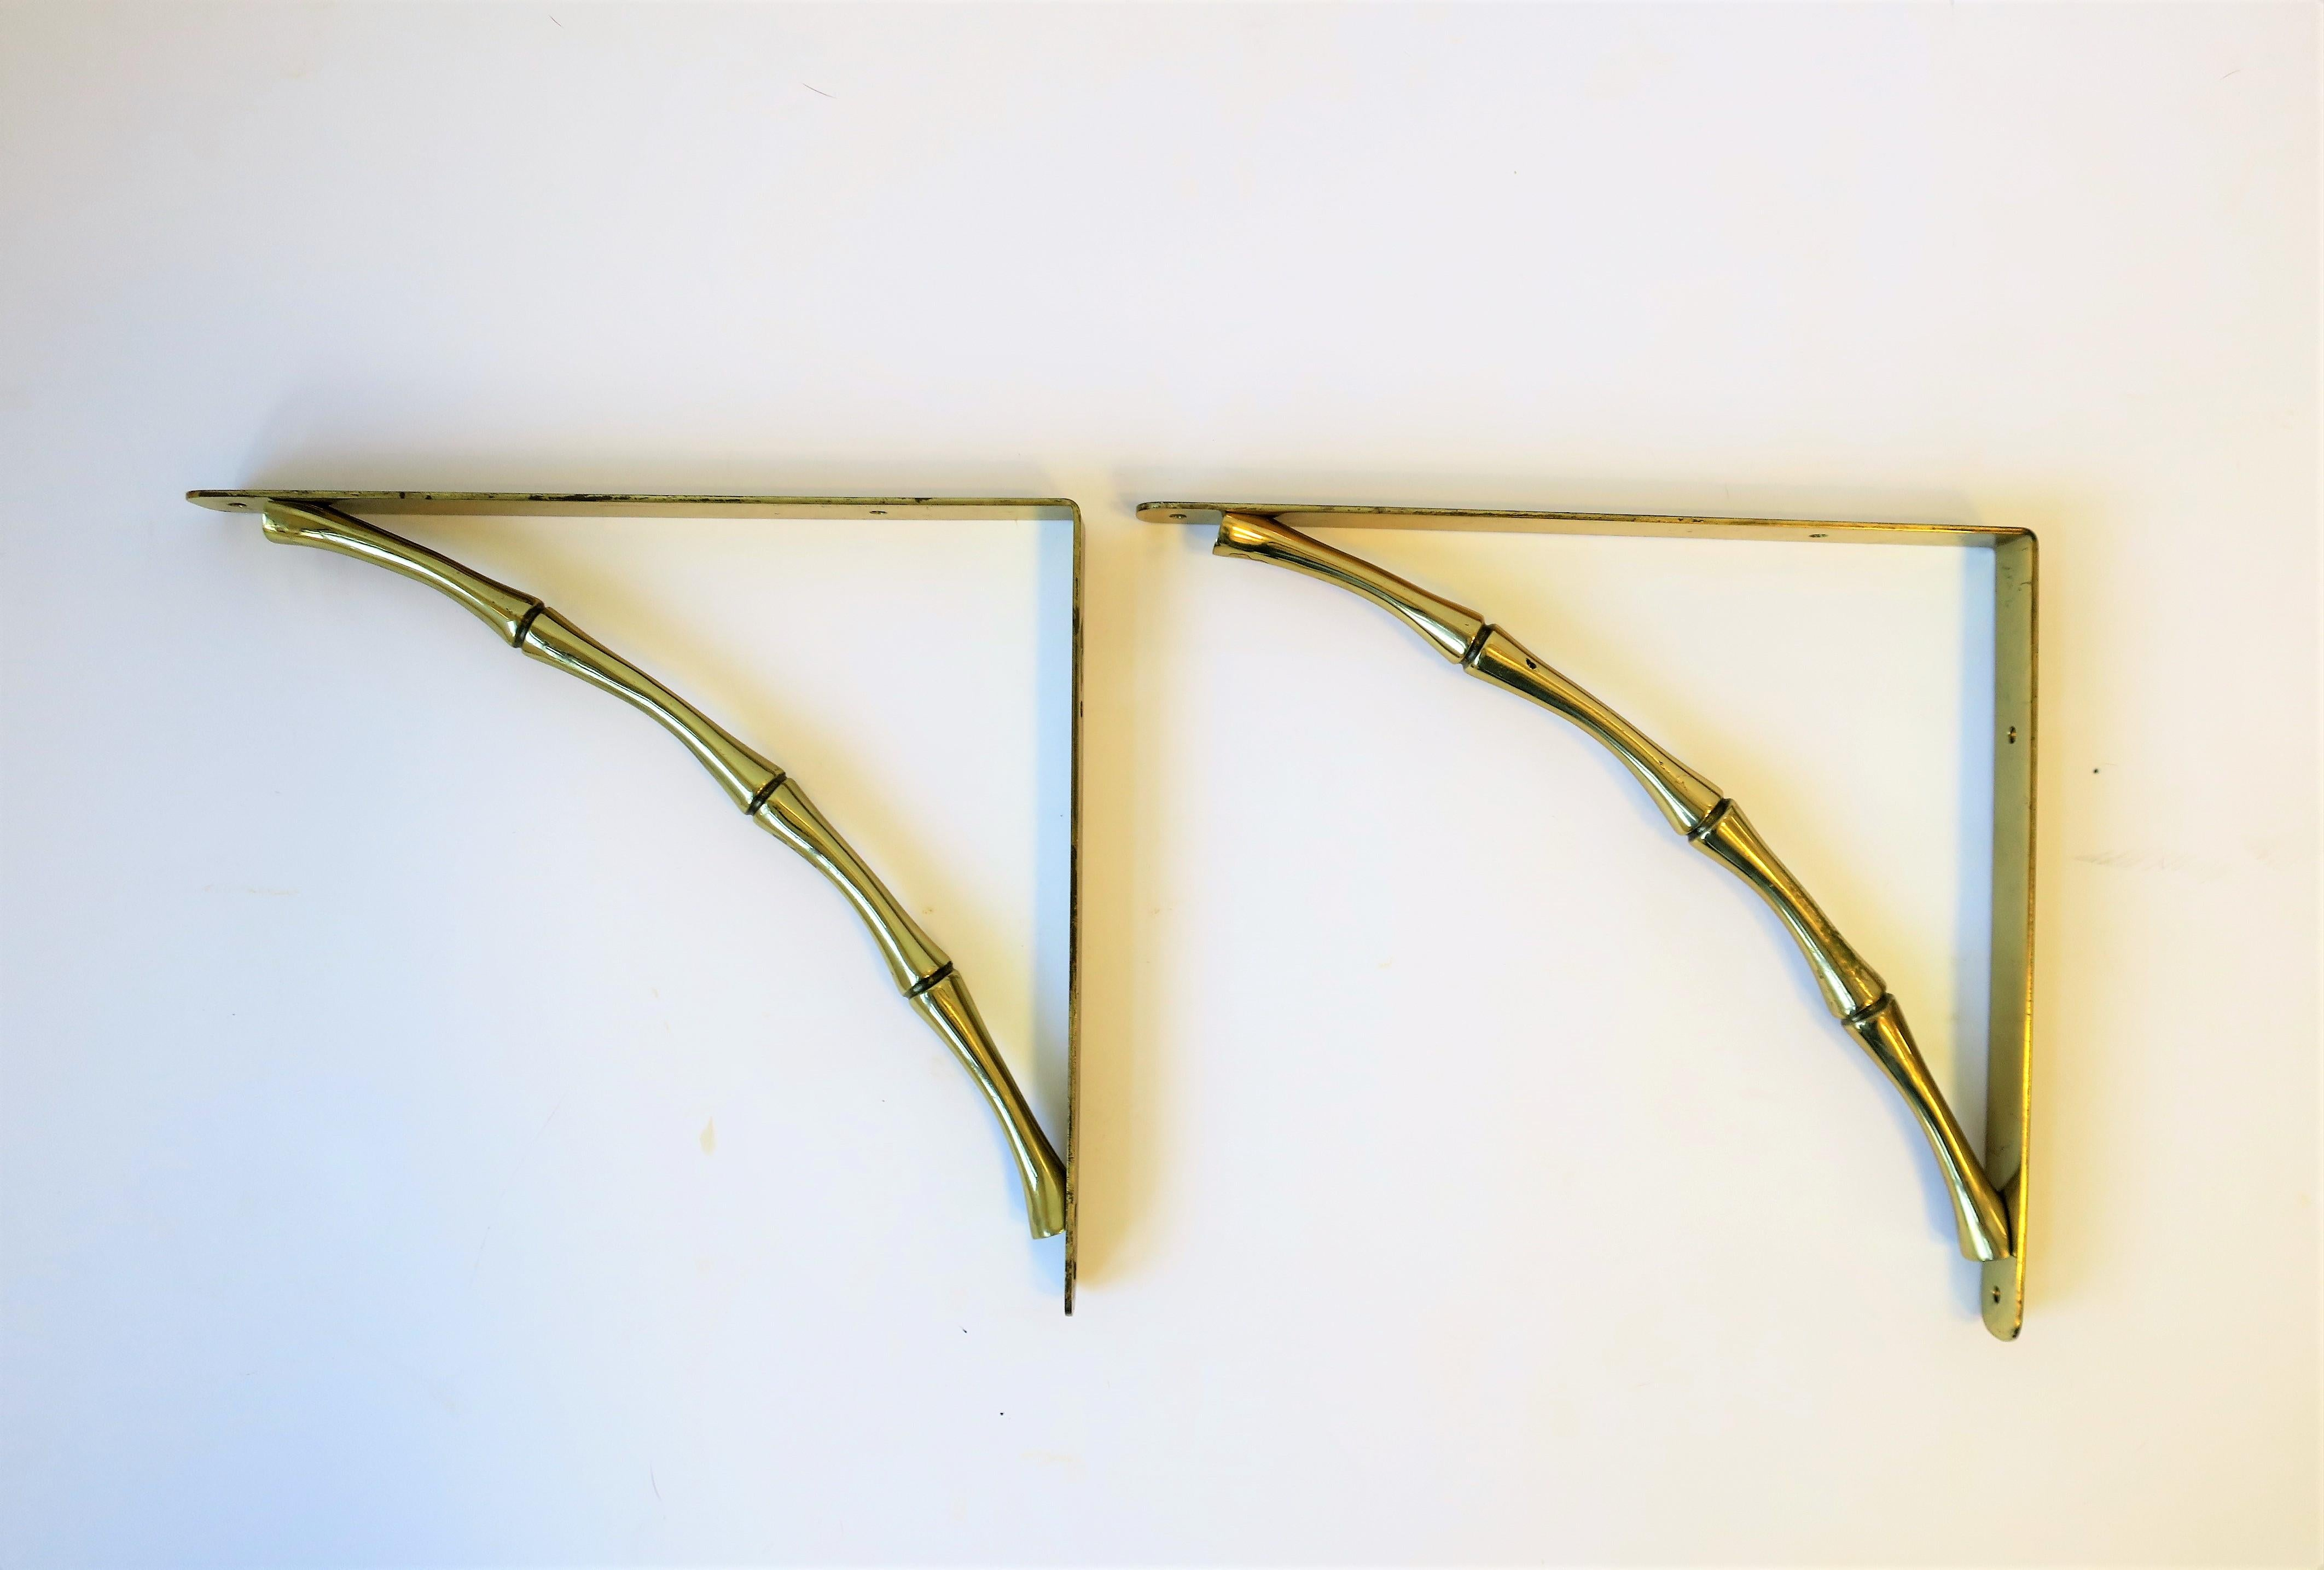 Hollywood Regency Brass Bamboo Hardware Wall Shelf Brackets For Sale